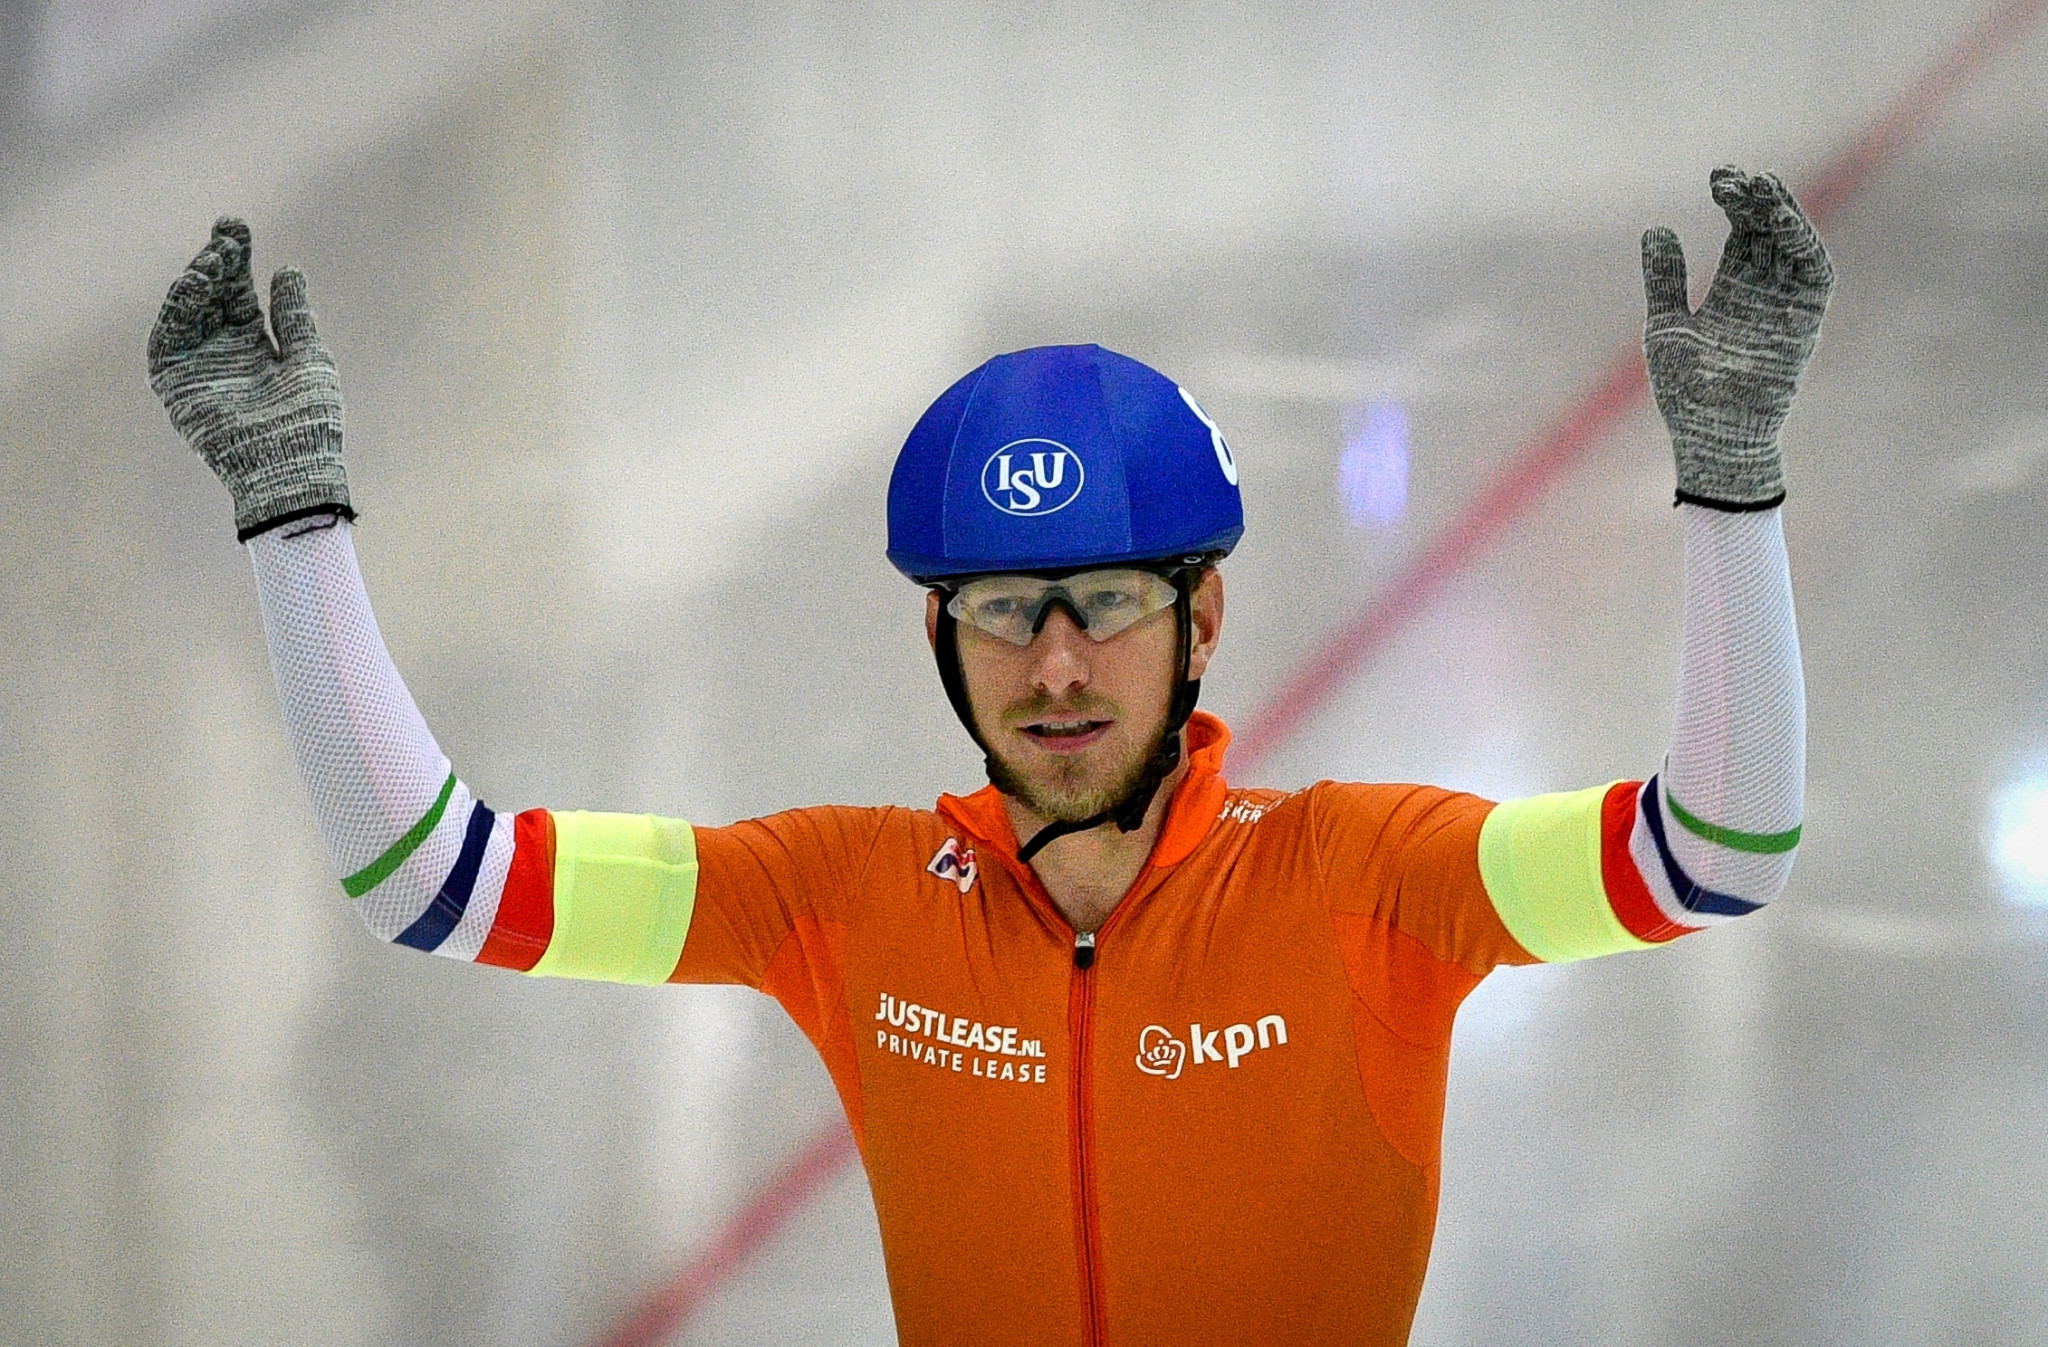 Blokhuijsen and Lollobrigida win mass start titles at European Speed Skating Championships